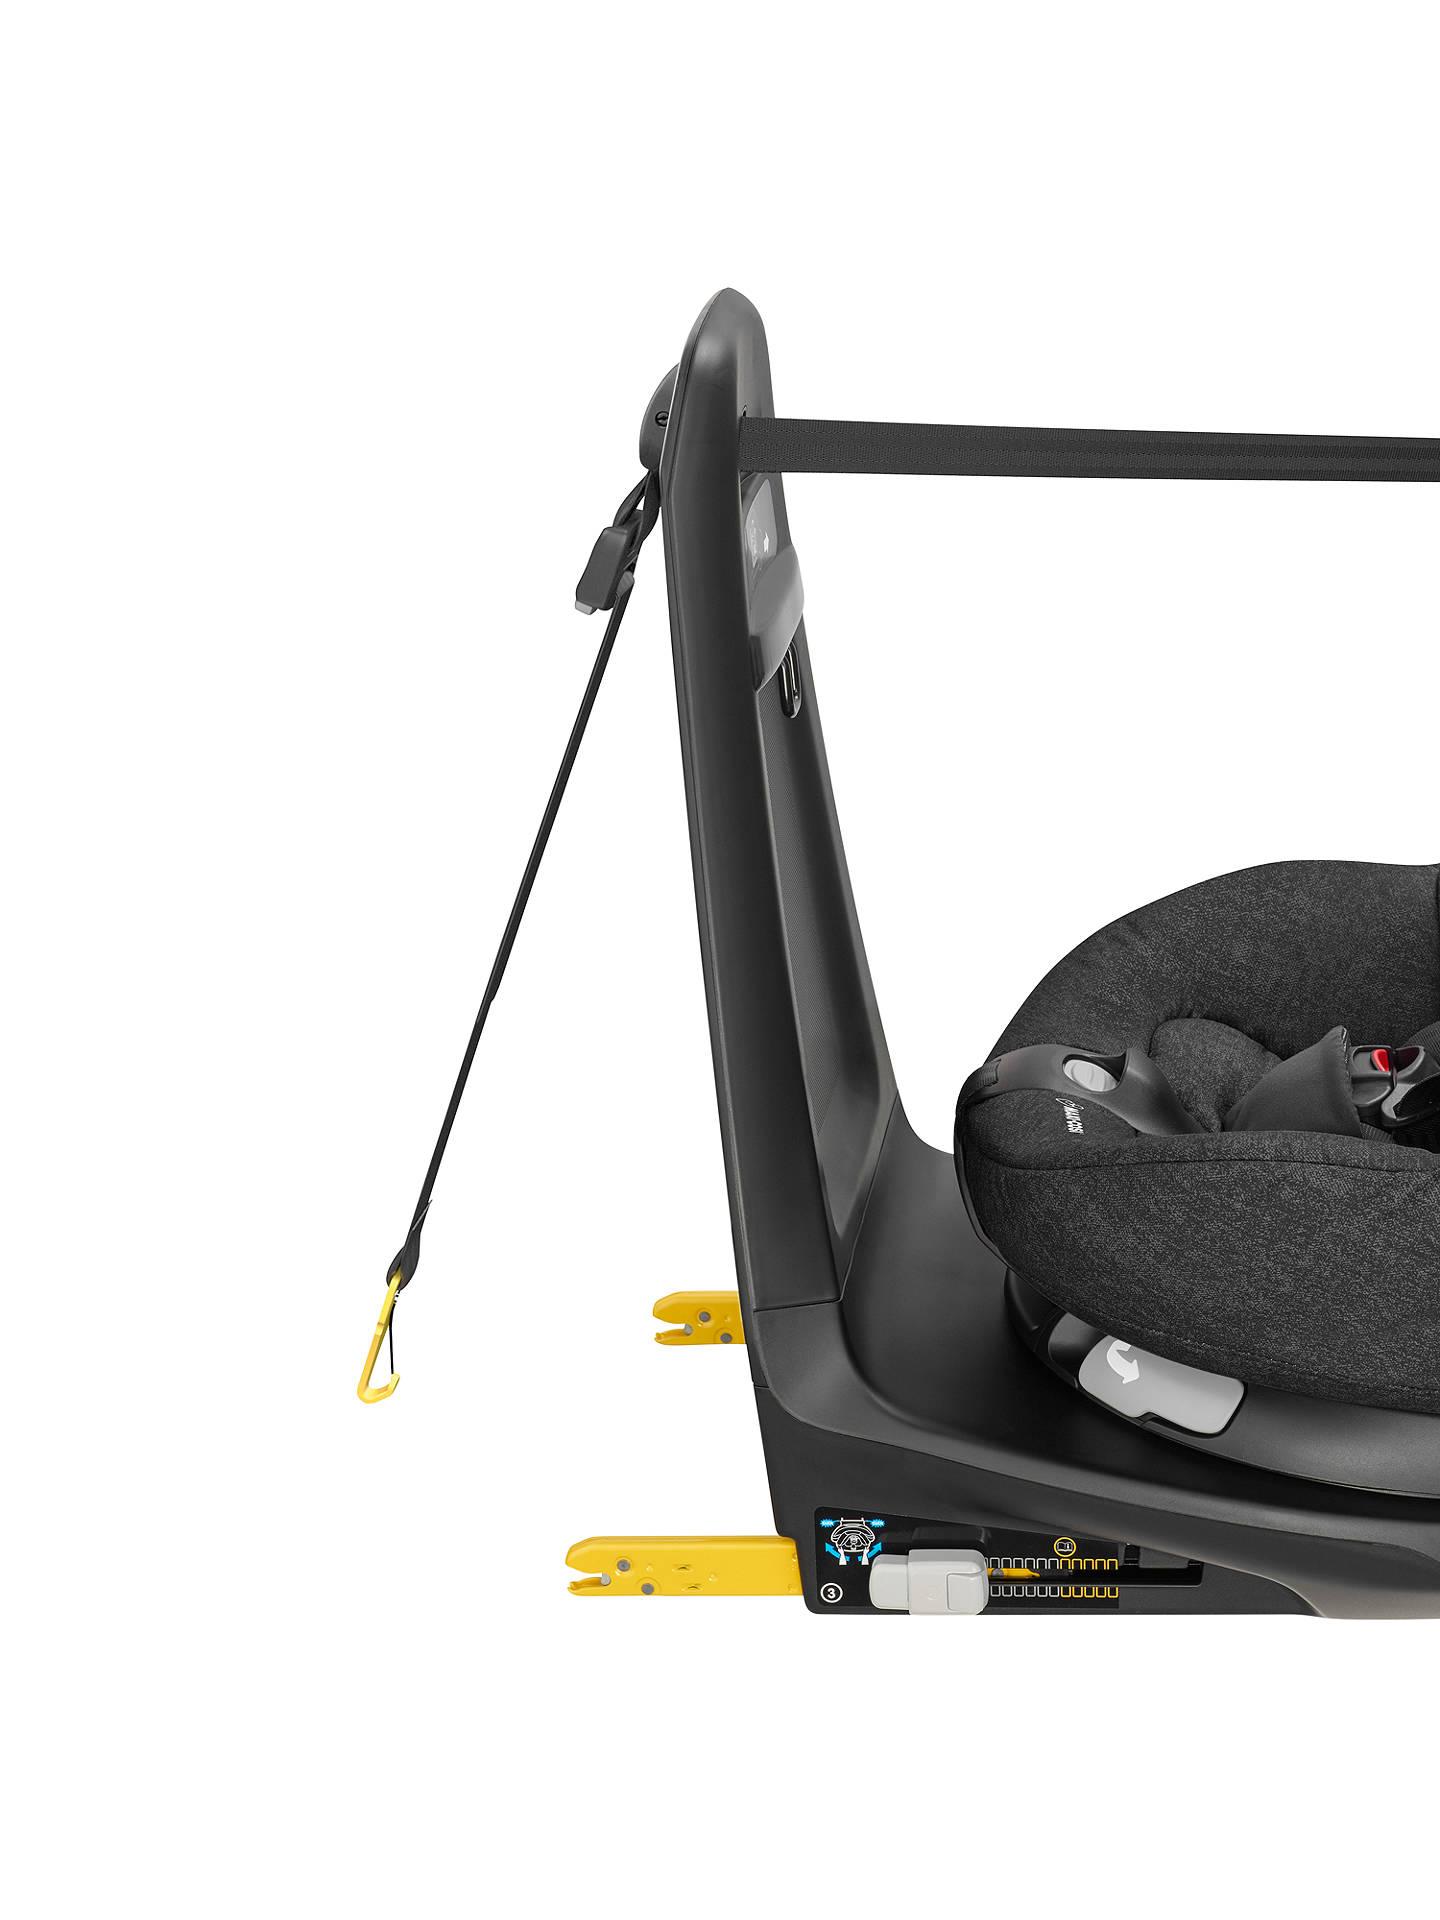 acaa0115839 ... Buy Maxi-Cosi AxissFix Group 1 i-Size Car Seat, Nomad Black Online ...